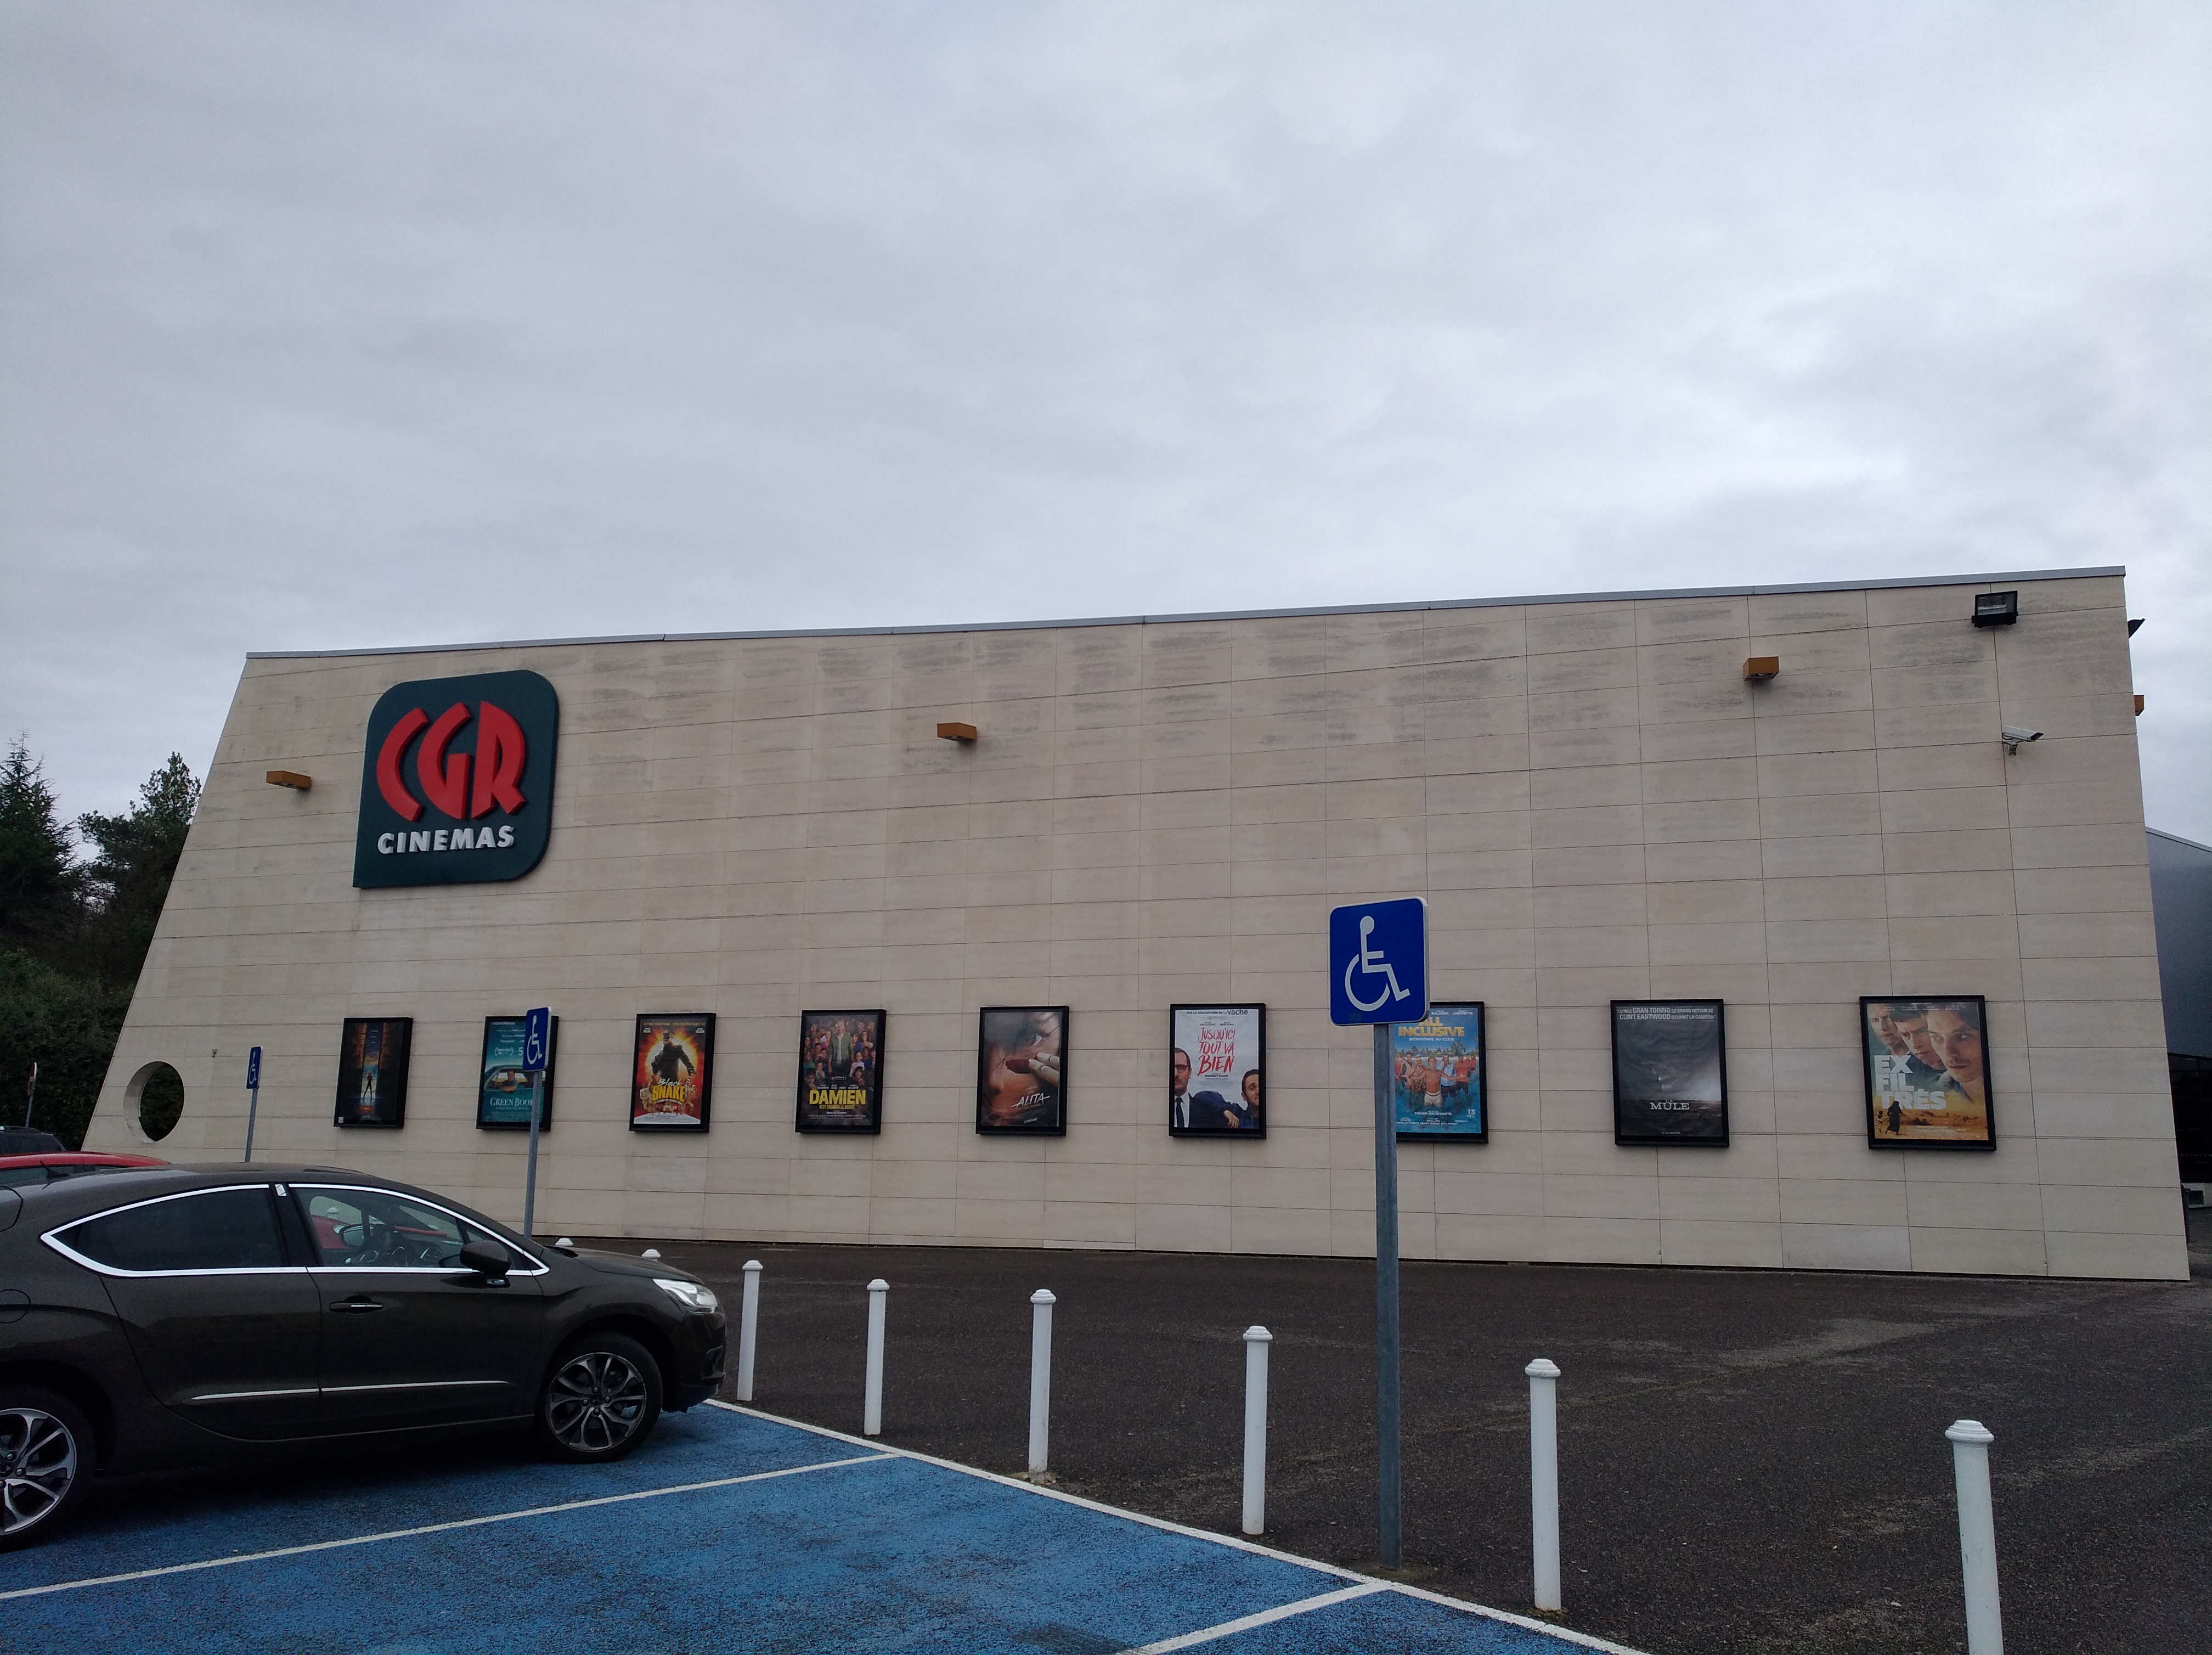 File:Brignais - Cinéma CGR 9 (mars 2099).jpg - Wikimedia Commons